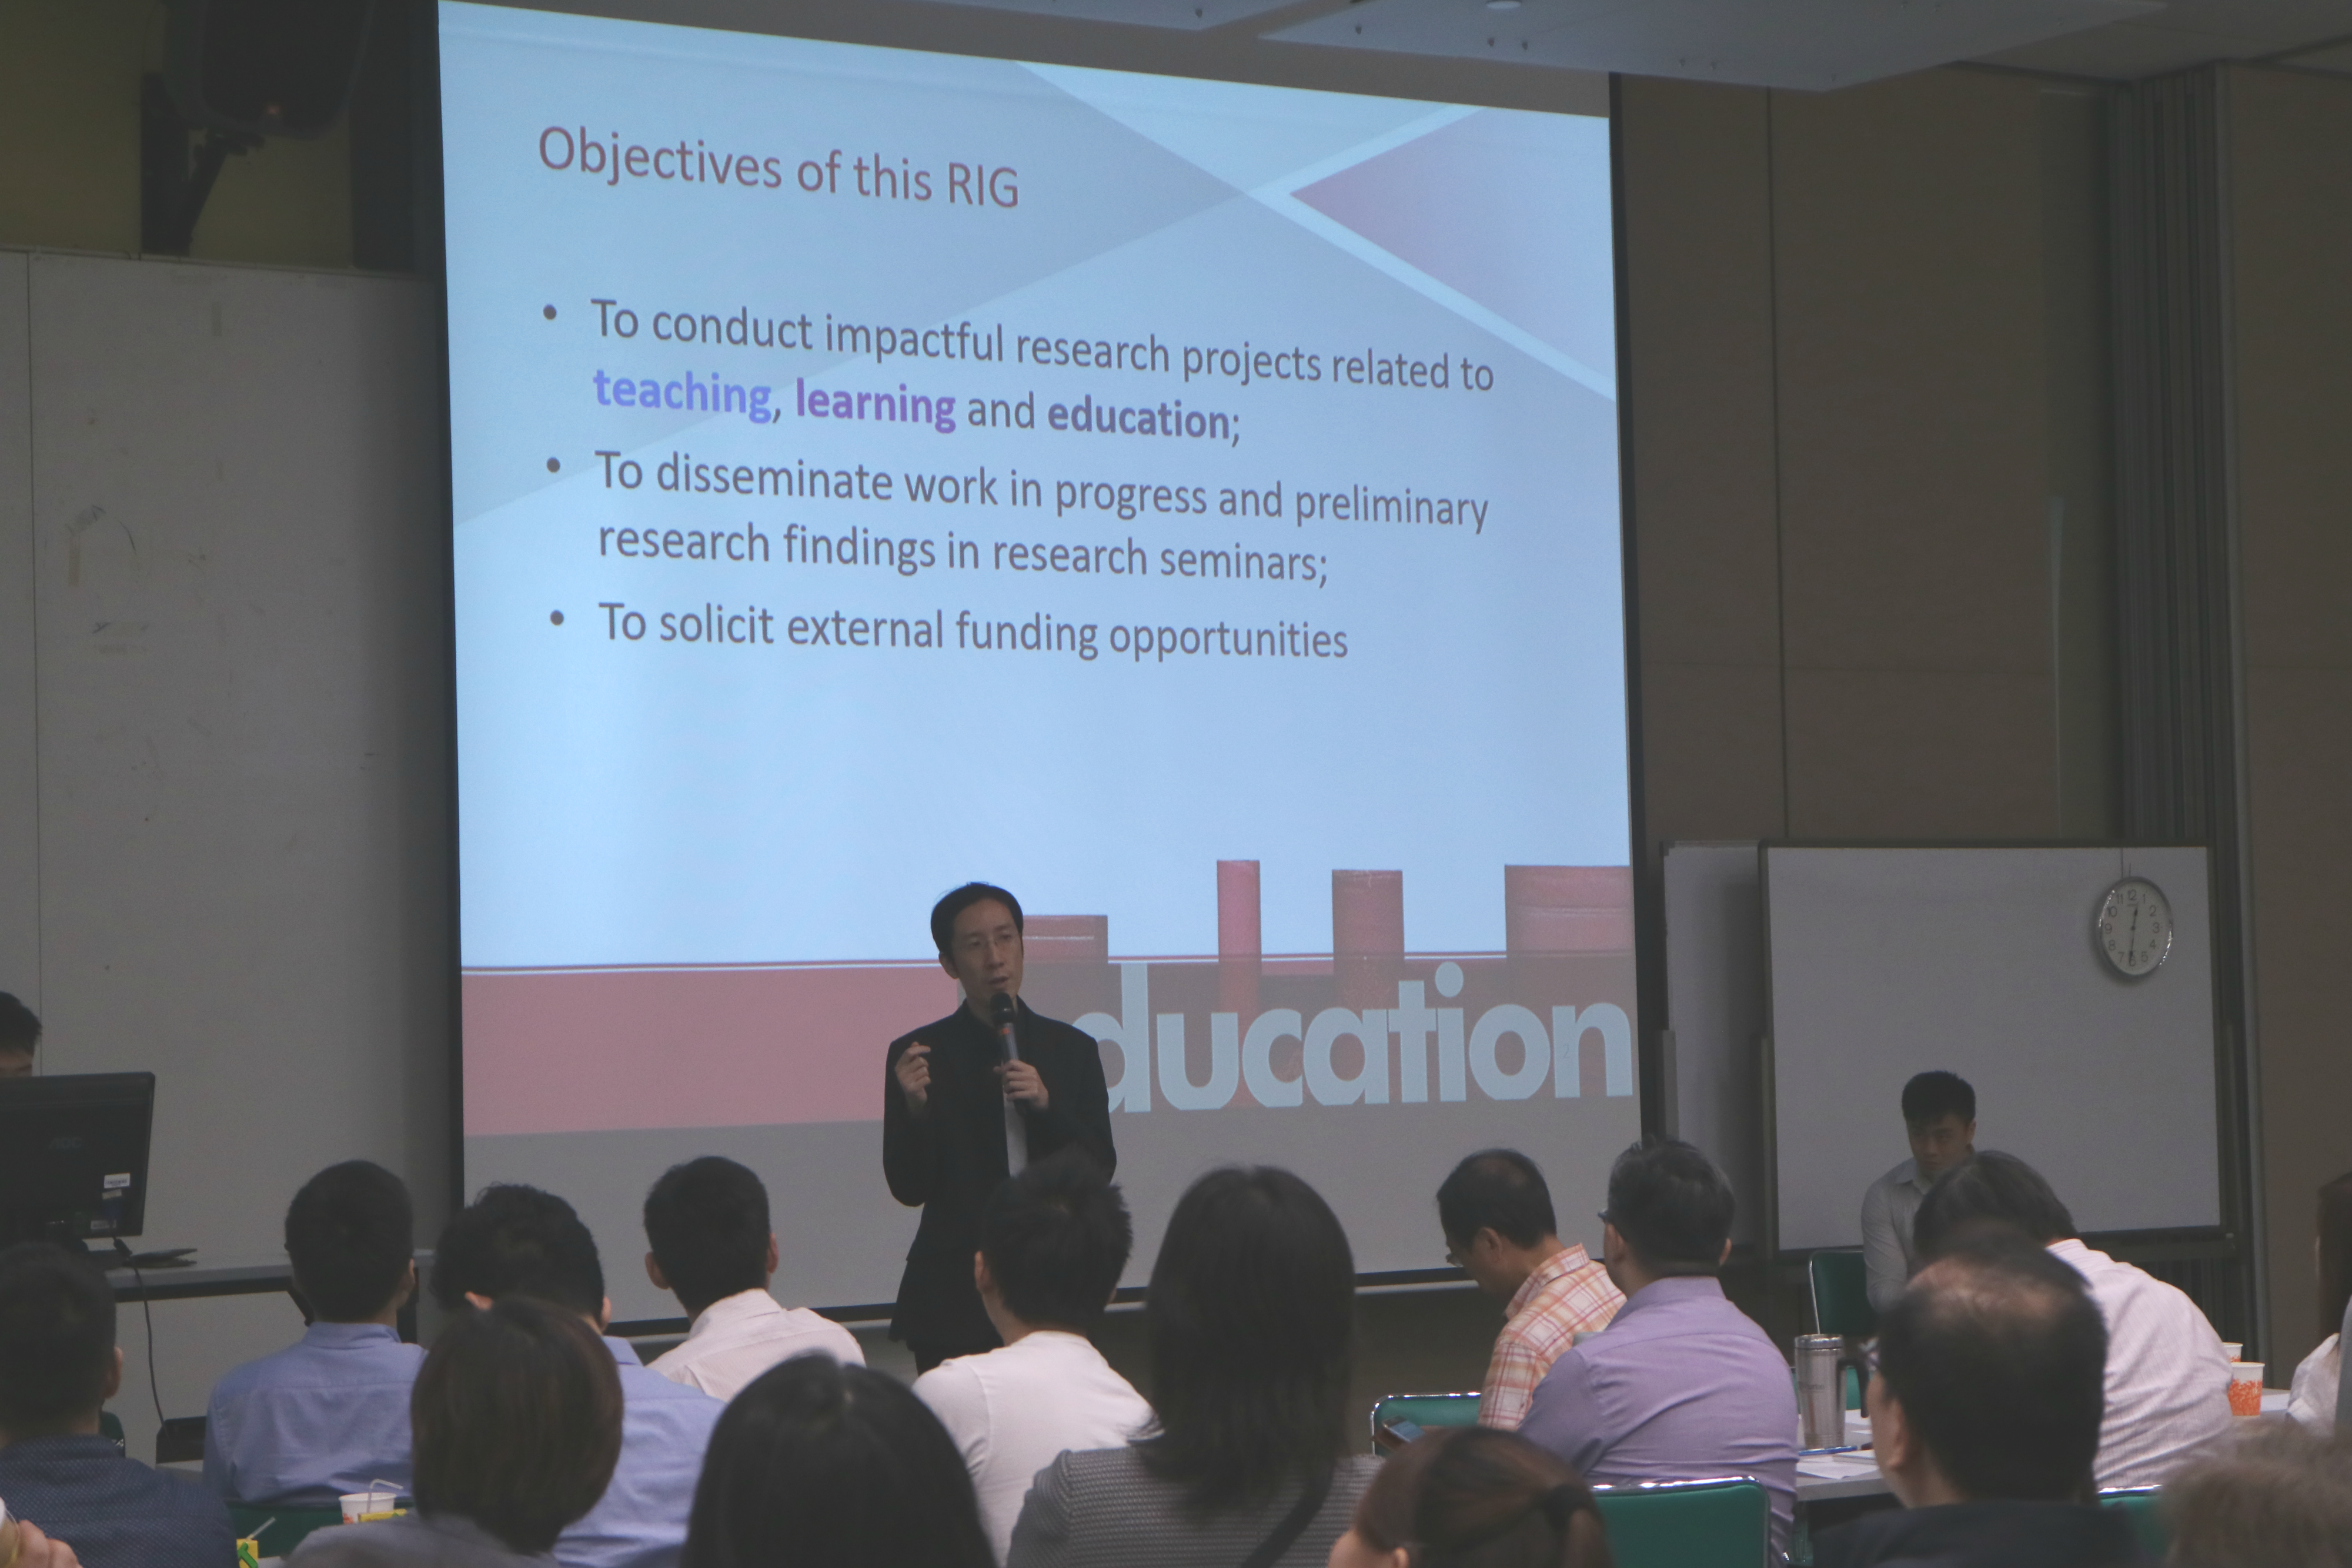 Dr. Felix Tang's sharing 鄧子龍博士之分享